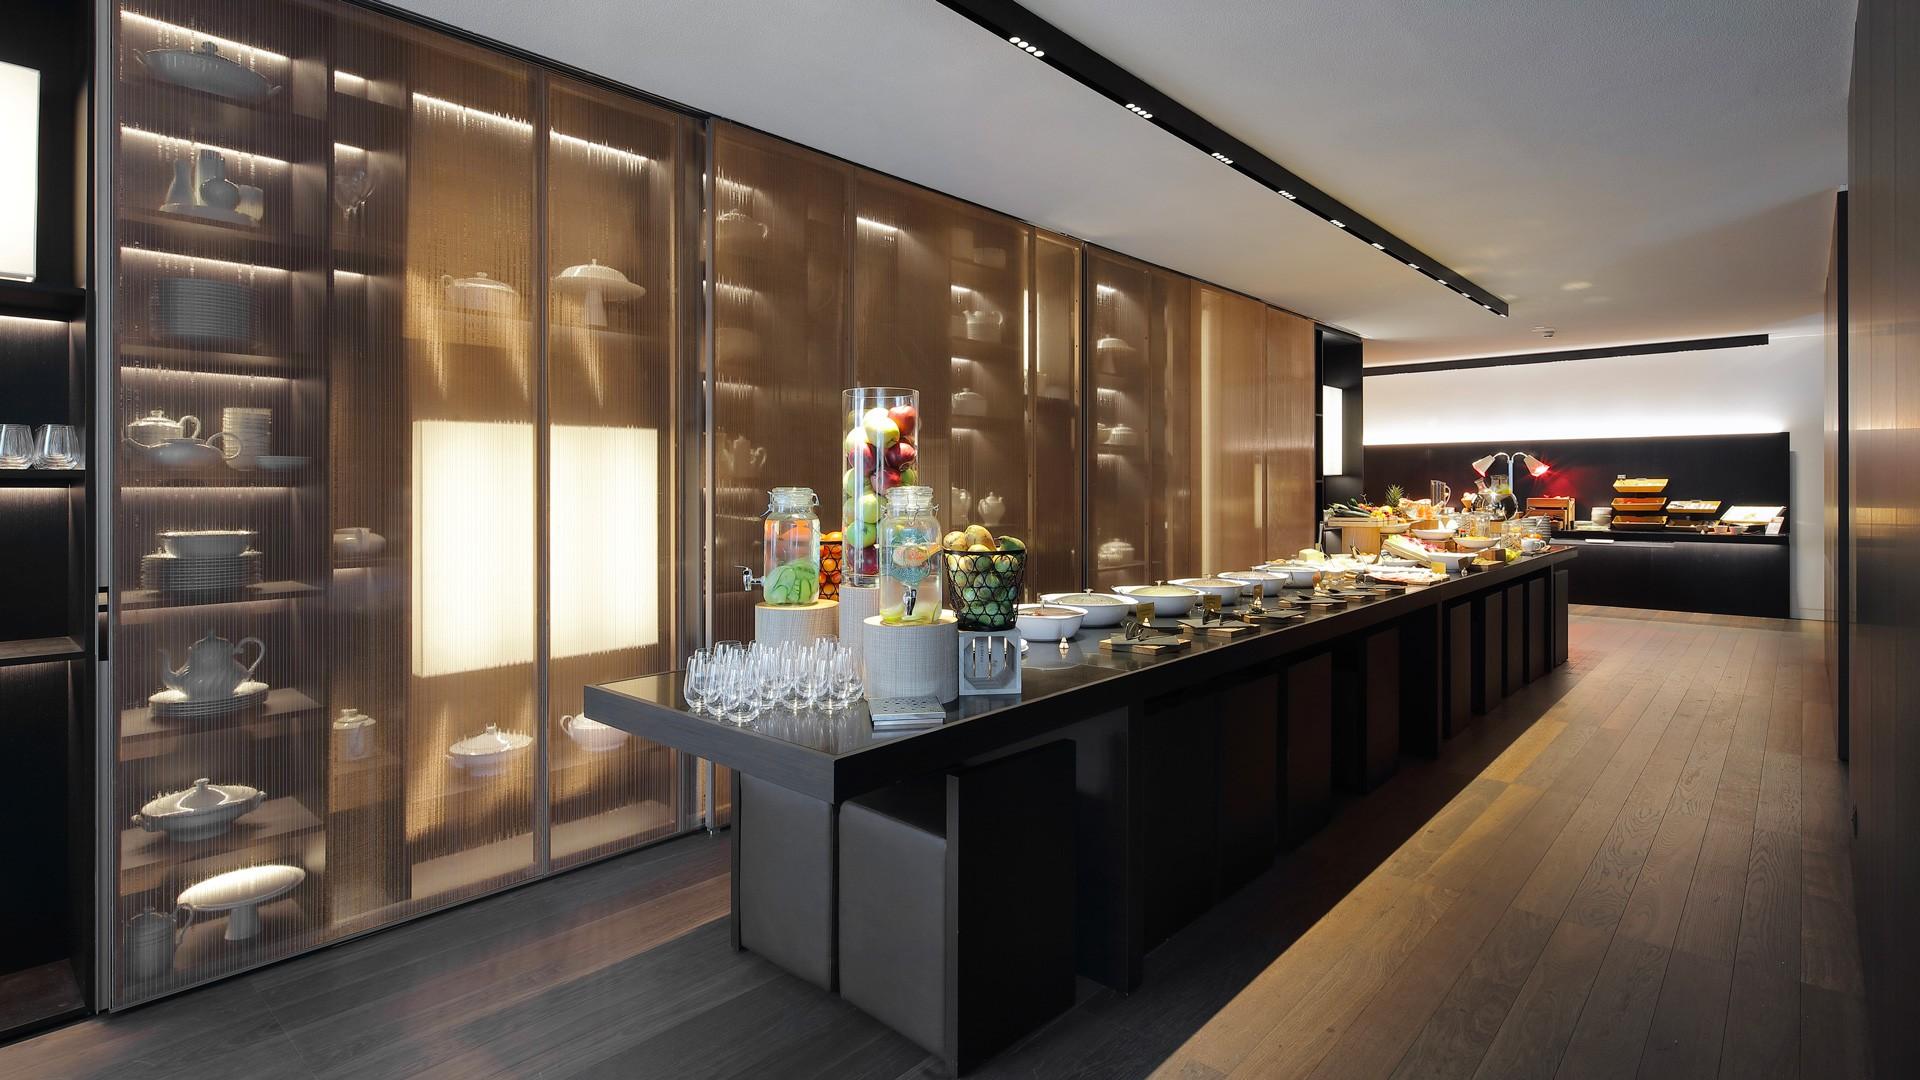 Poliform_contract_hospitality_HILTON_LAKECOMO_04_1920x1080px_gallery